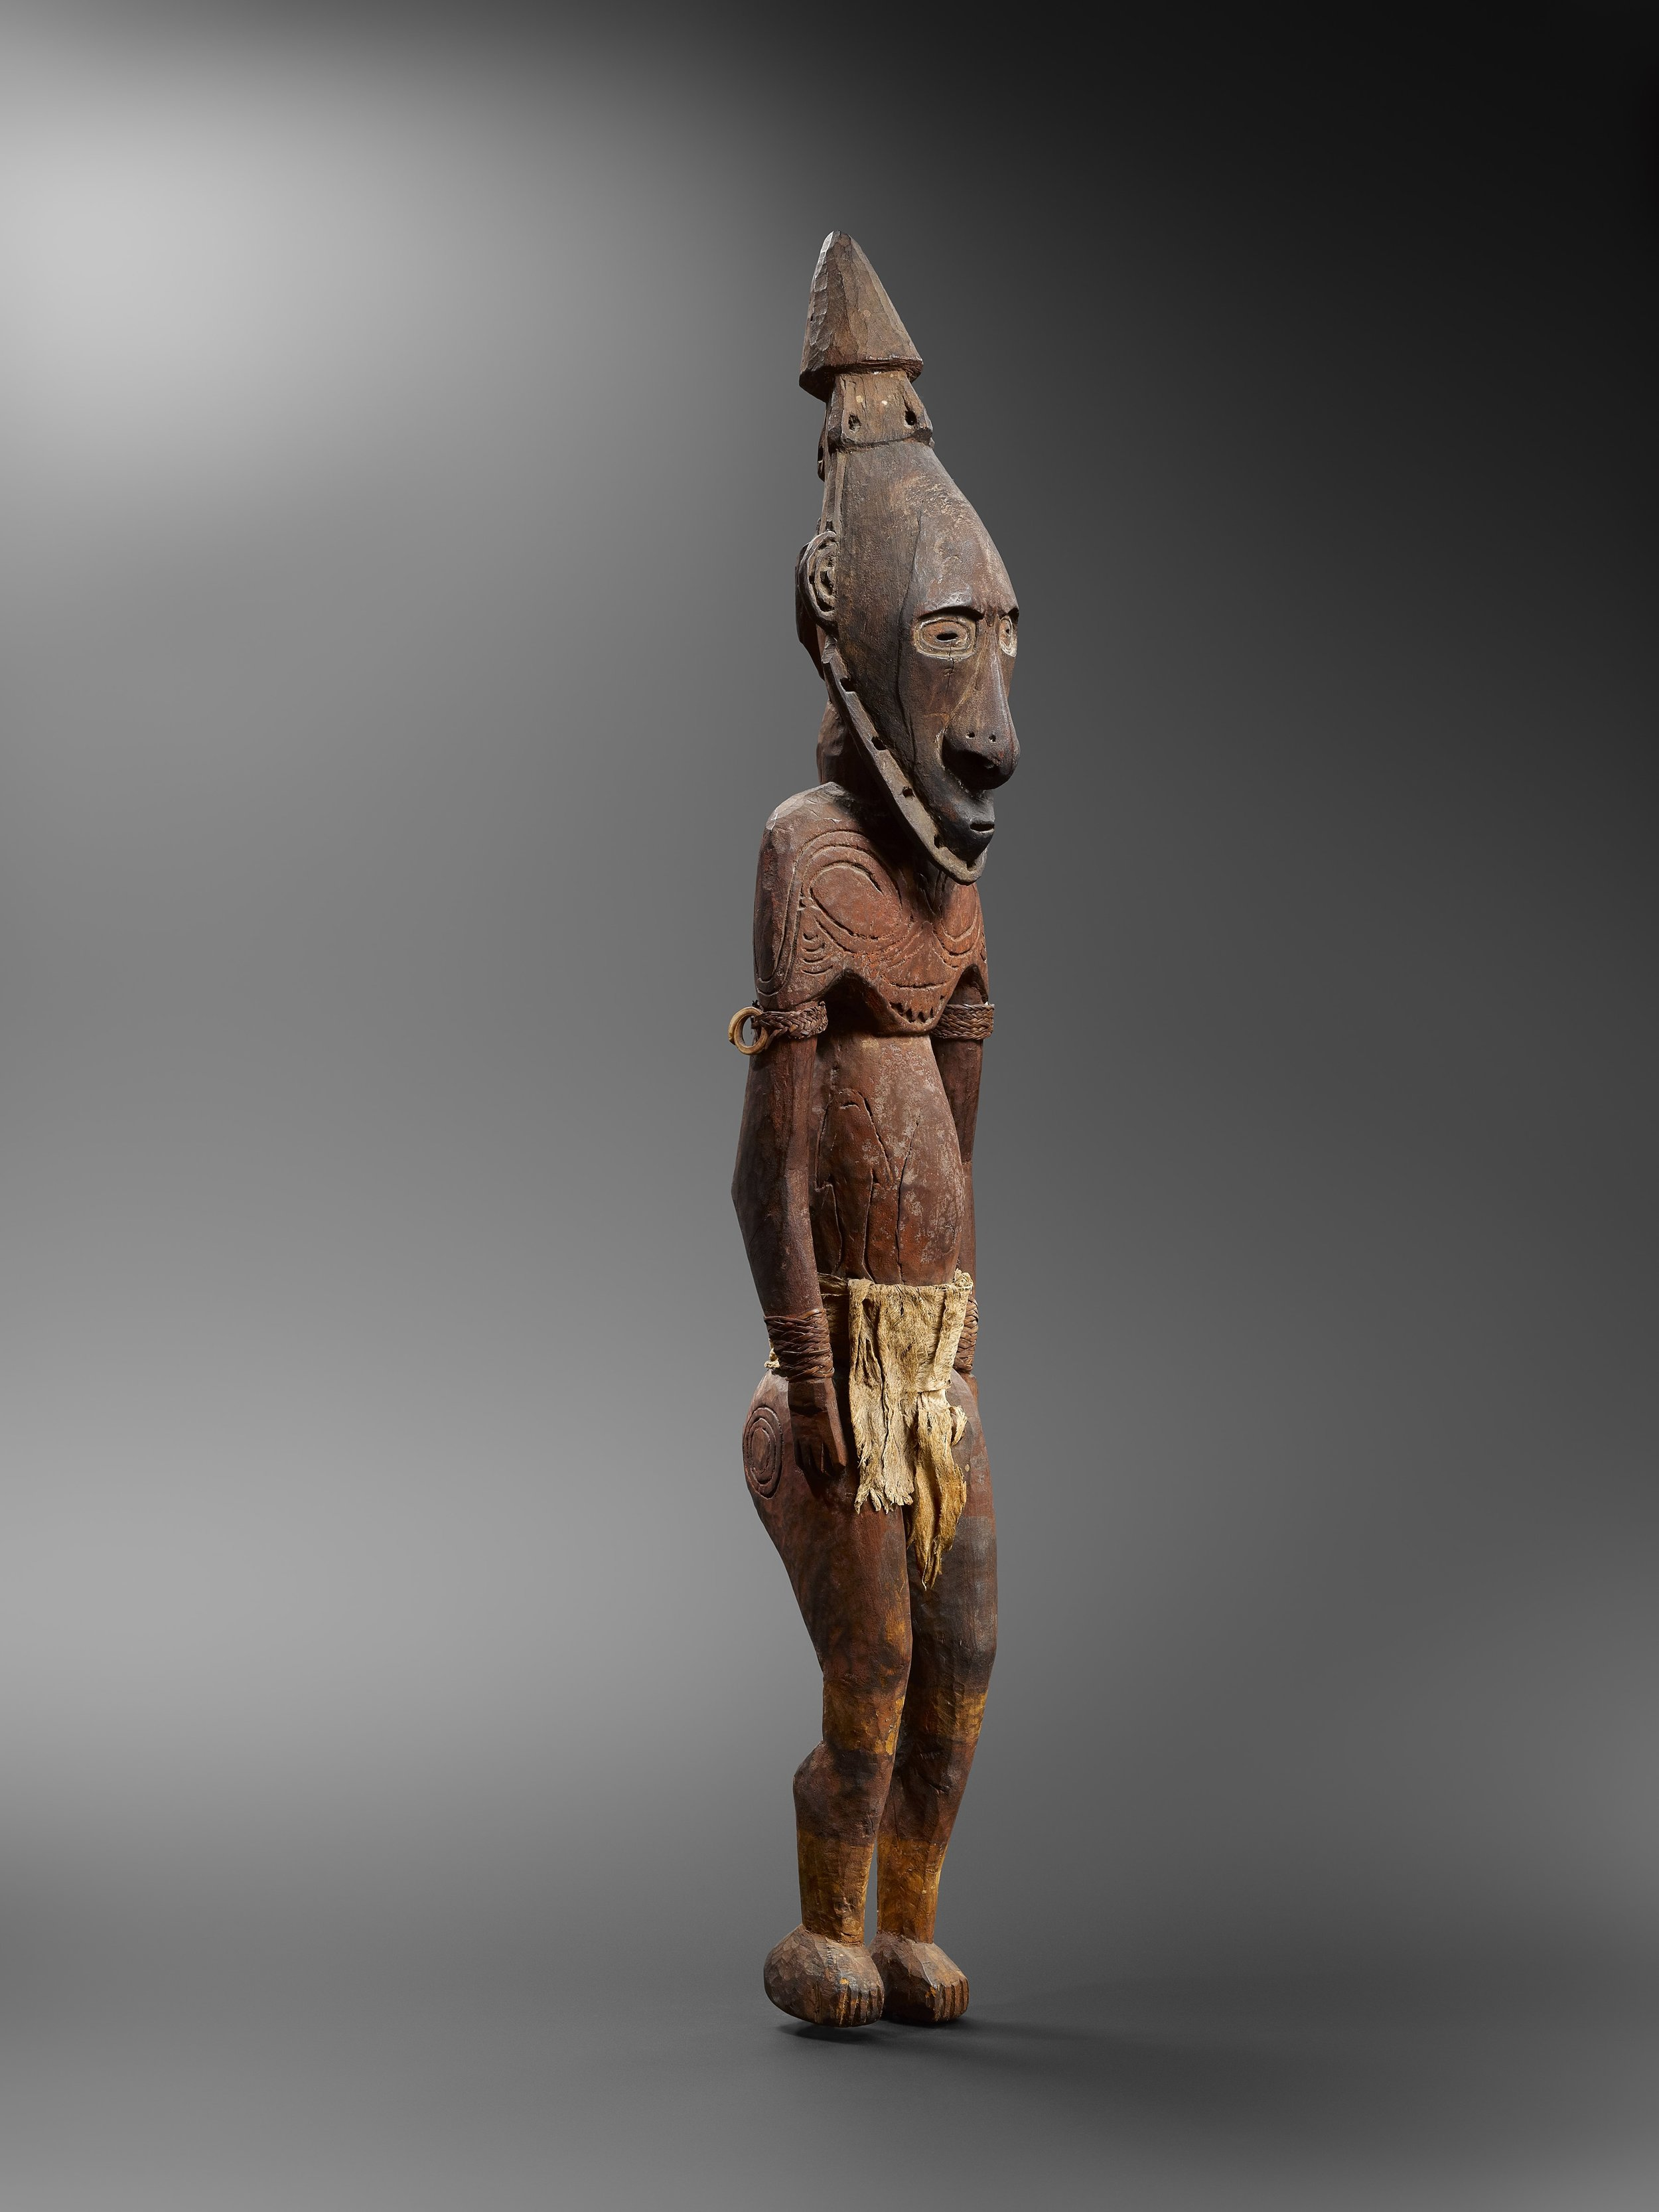 Ancestor figure,  kandimbong.  Watam or Murik Lakes. Wood, fibre, tapa, shells and pigments. 121.5 cm. Frau Zimmer, Munich. © Hugues Dubois, Brussels/Paris